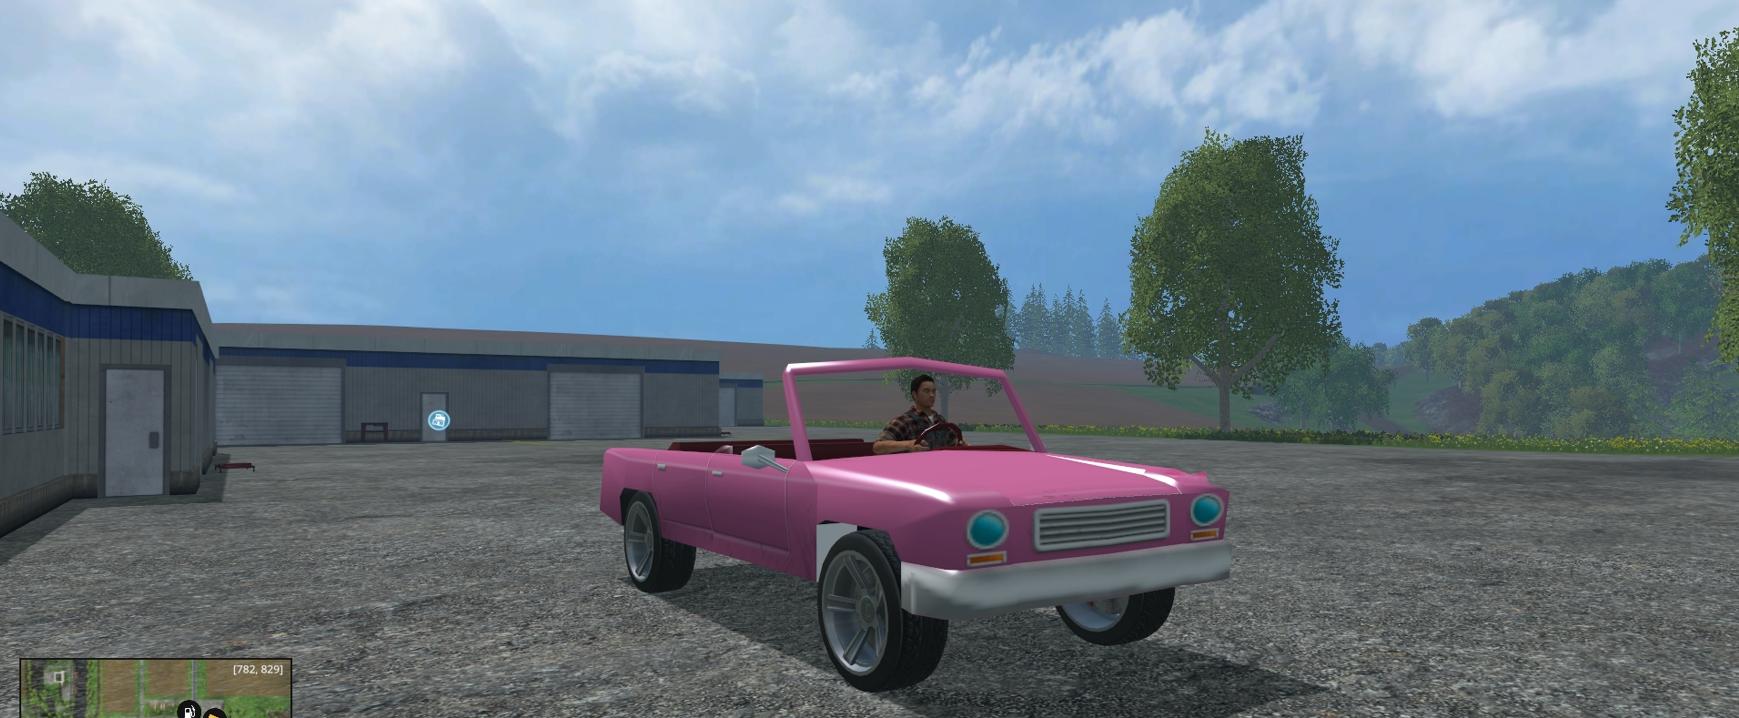 Homer Car: Farming Simulator 15